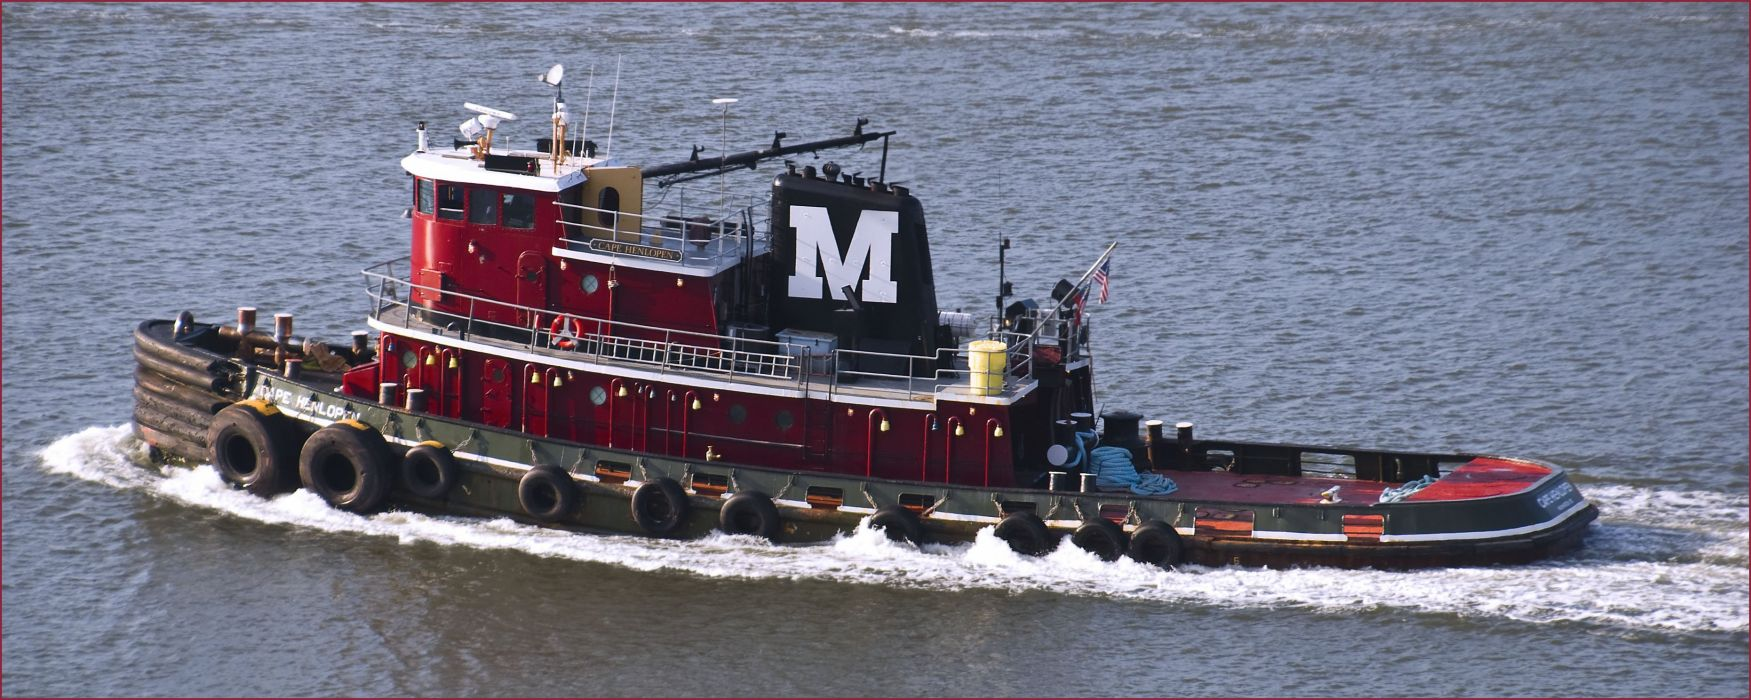 TUGBOAT ship boat tug marine (75) wallpaper